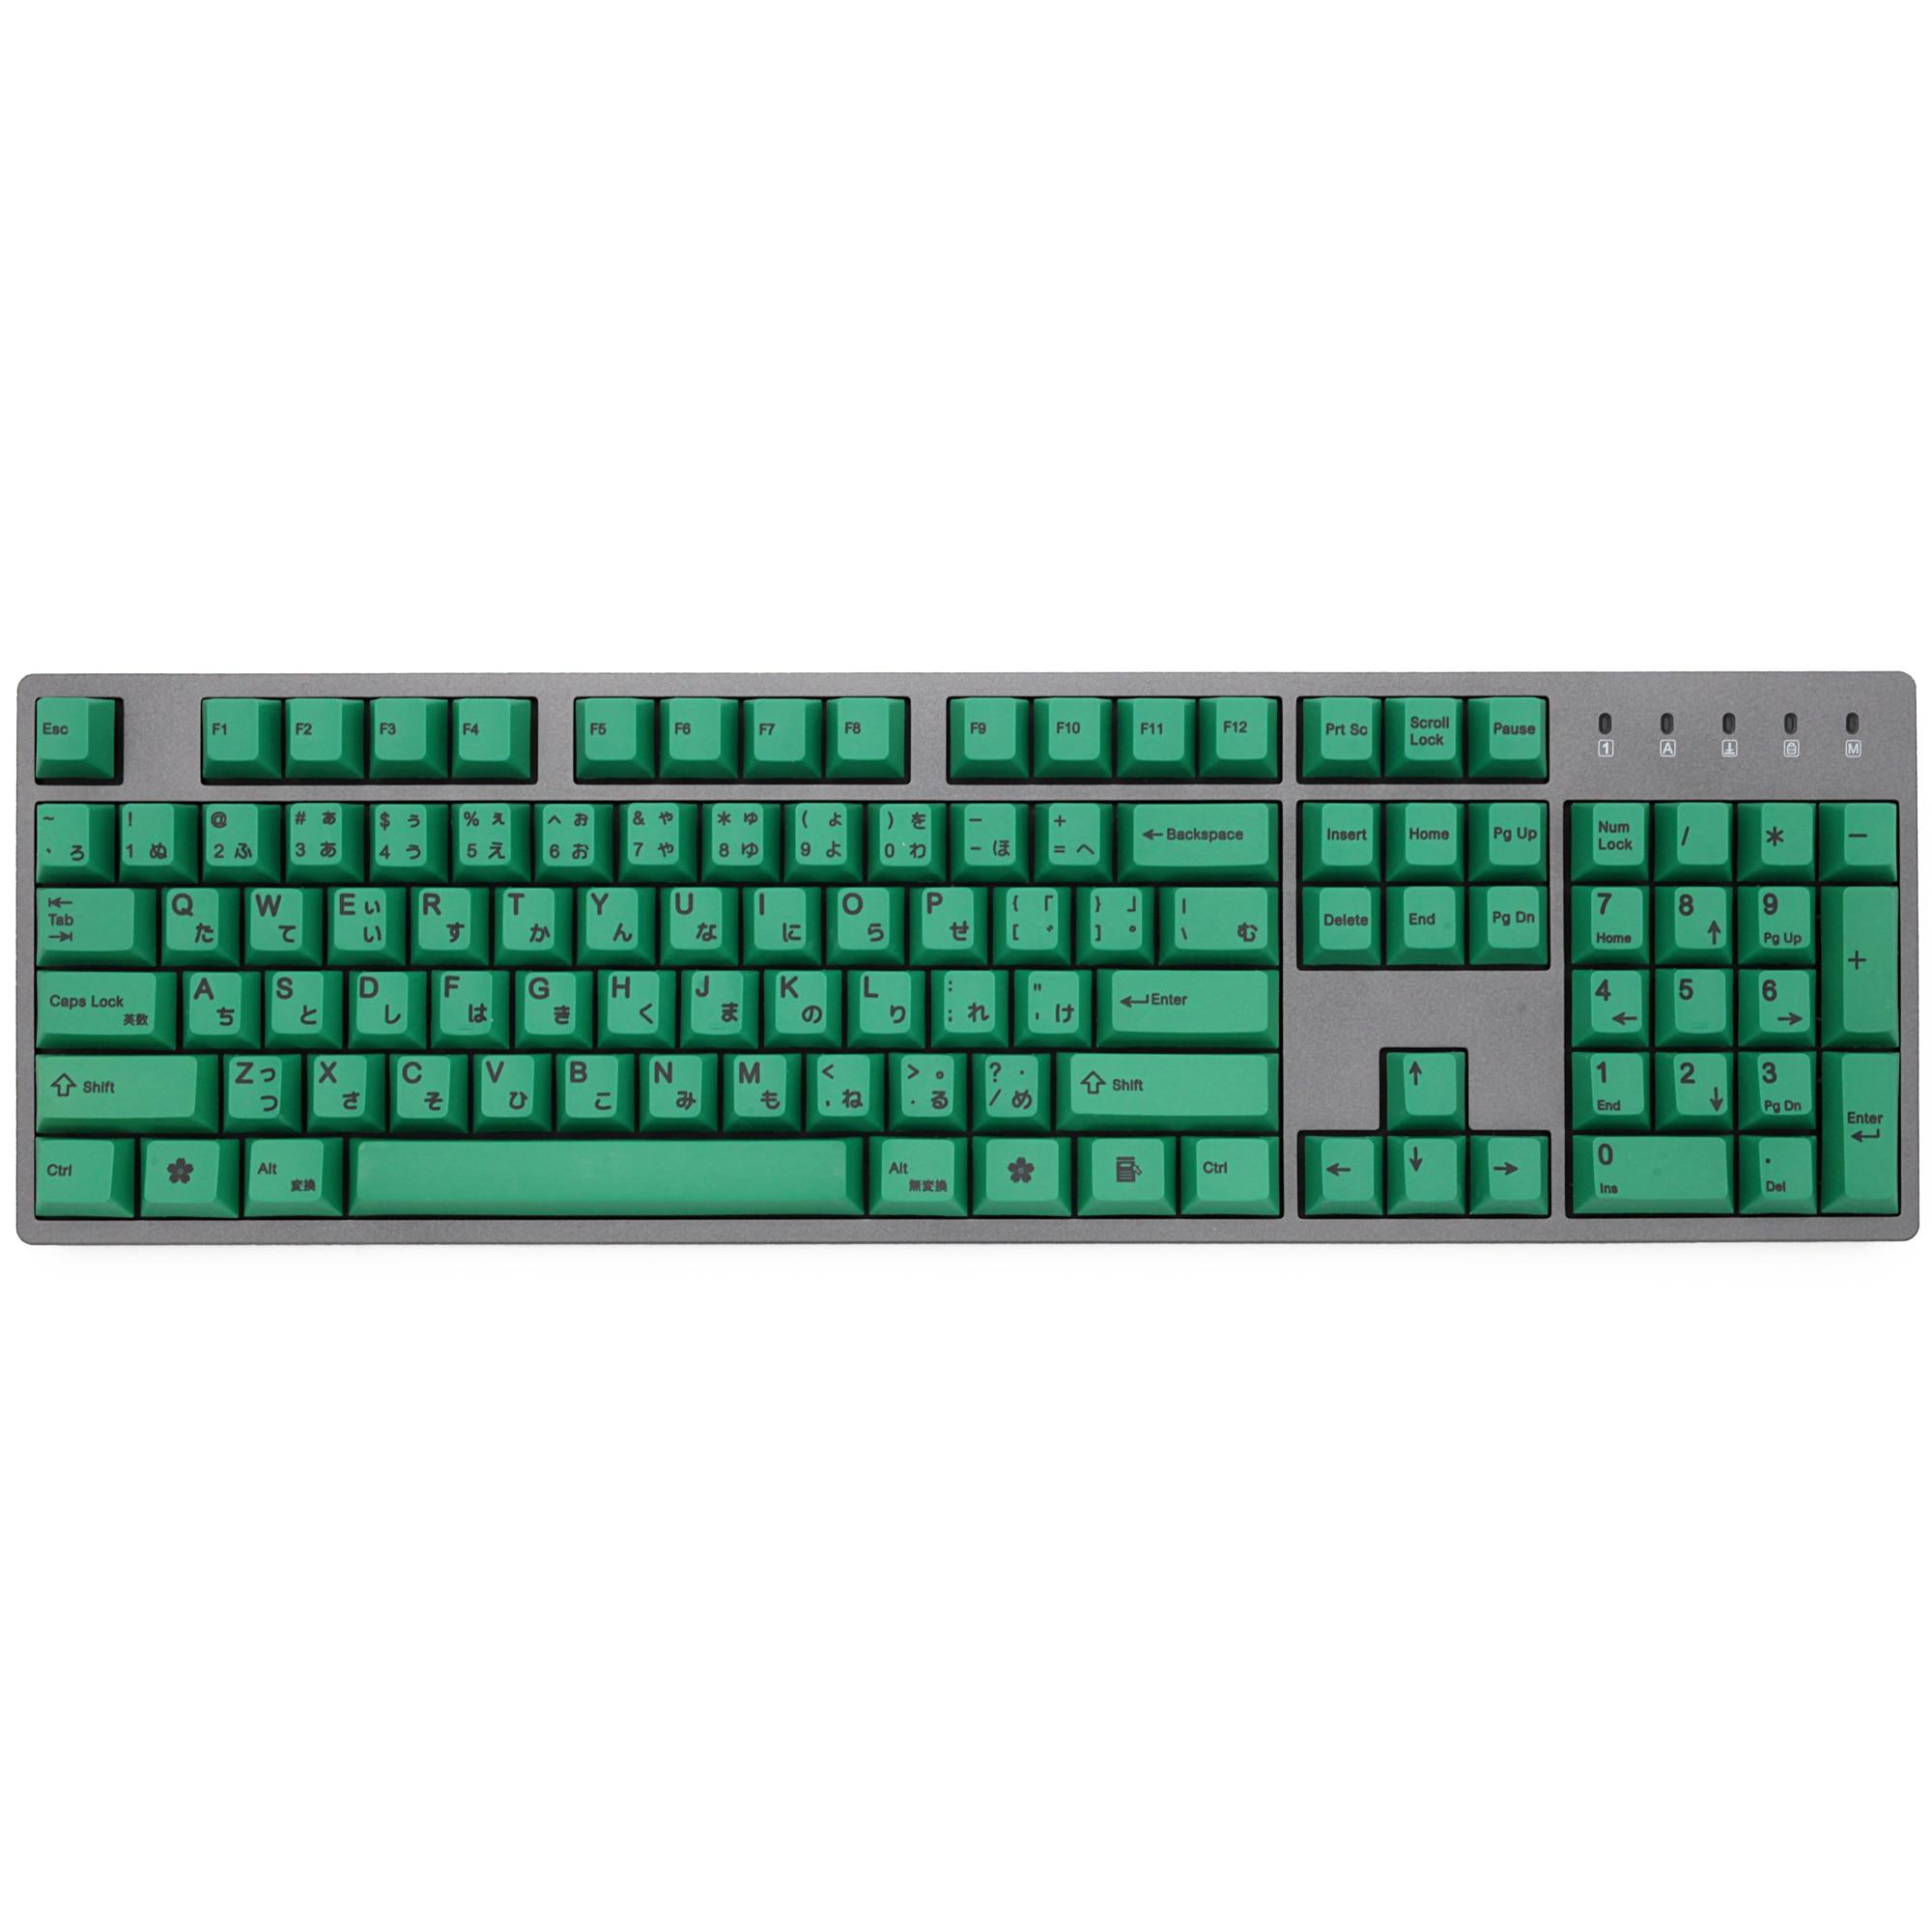 Green 139 Japanese Root Japan Black Font Language Cherry Profile Dye Sub Keycap PBT For Gh60 Xd60 Xd84 Cospad Tada68 87 104